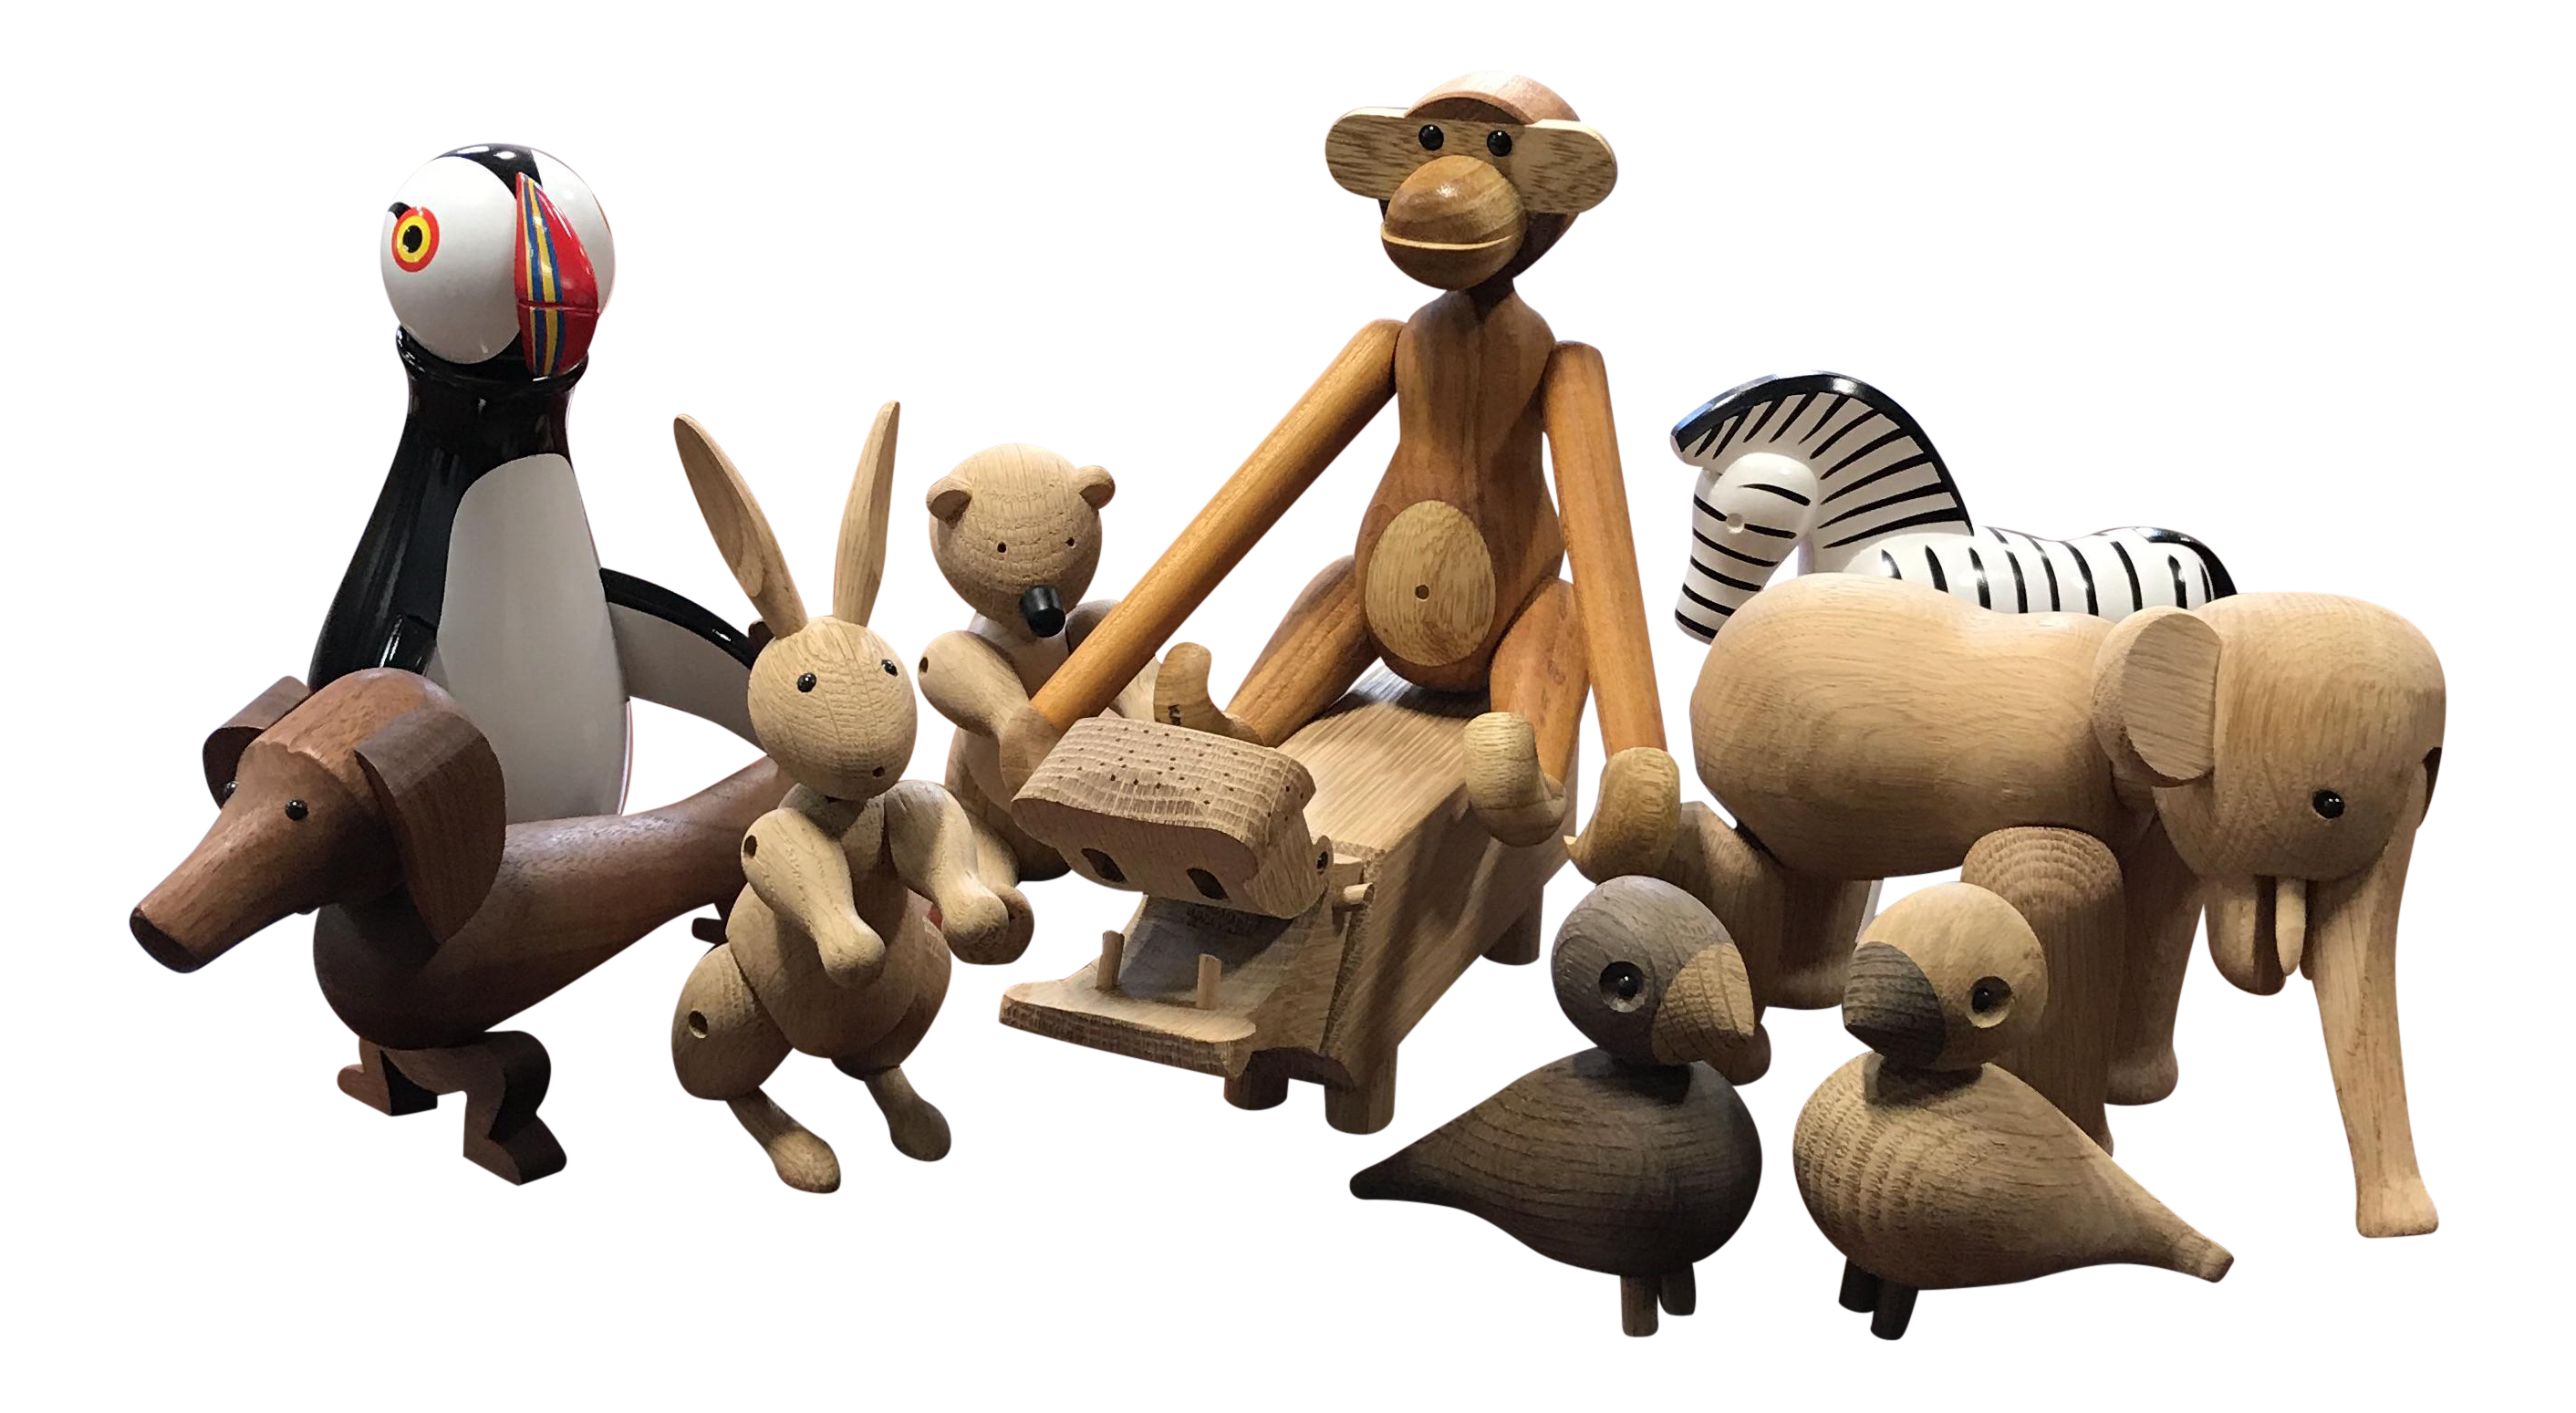 kay-bojesen-wooden-danish-toys-set-of-10-9348